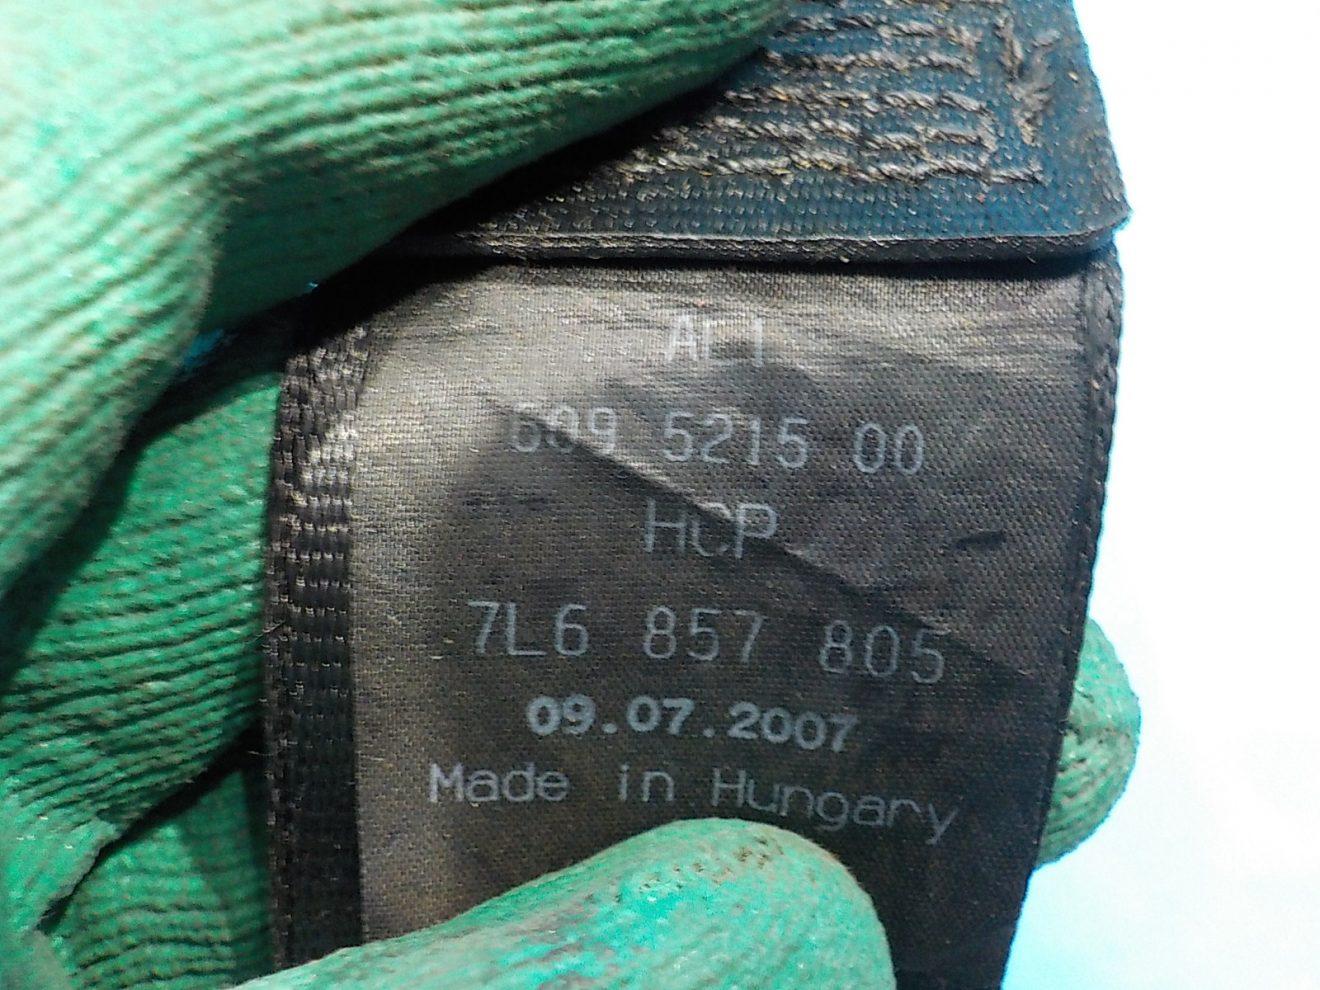 7L6857805BHCP Ремень безопасности задний левый VOLKSWAGEN Touareg 2002-2010